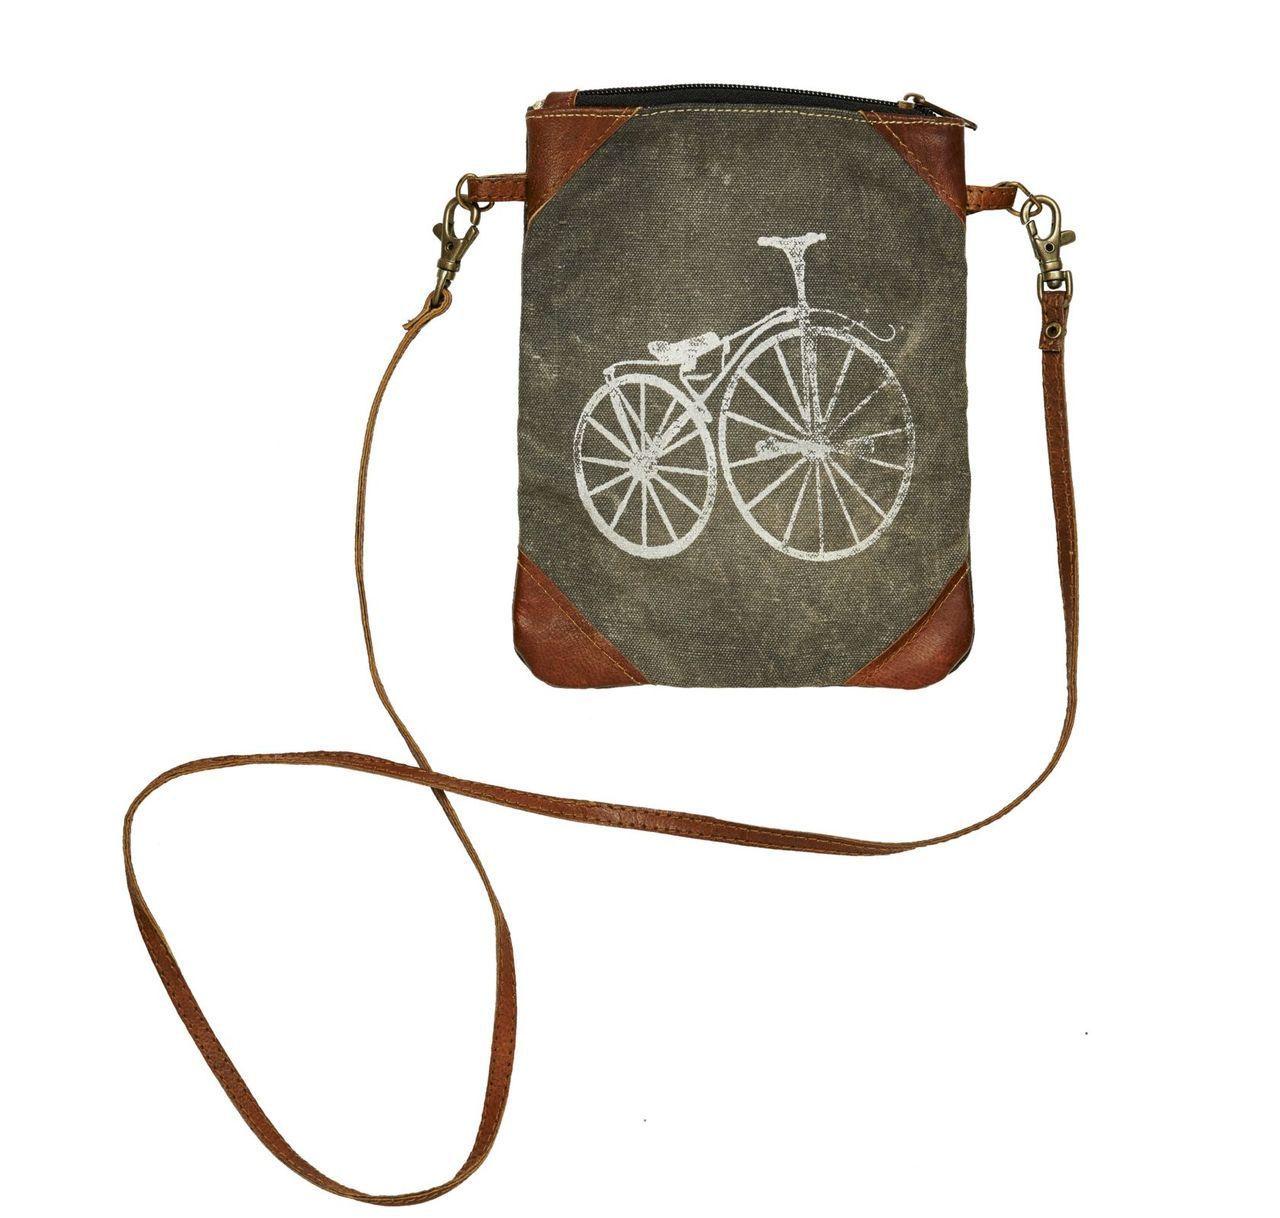 b04d42e86b71 Mona B Paris Streeter Recycled Canvas Small Crossbody Bag